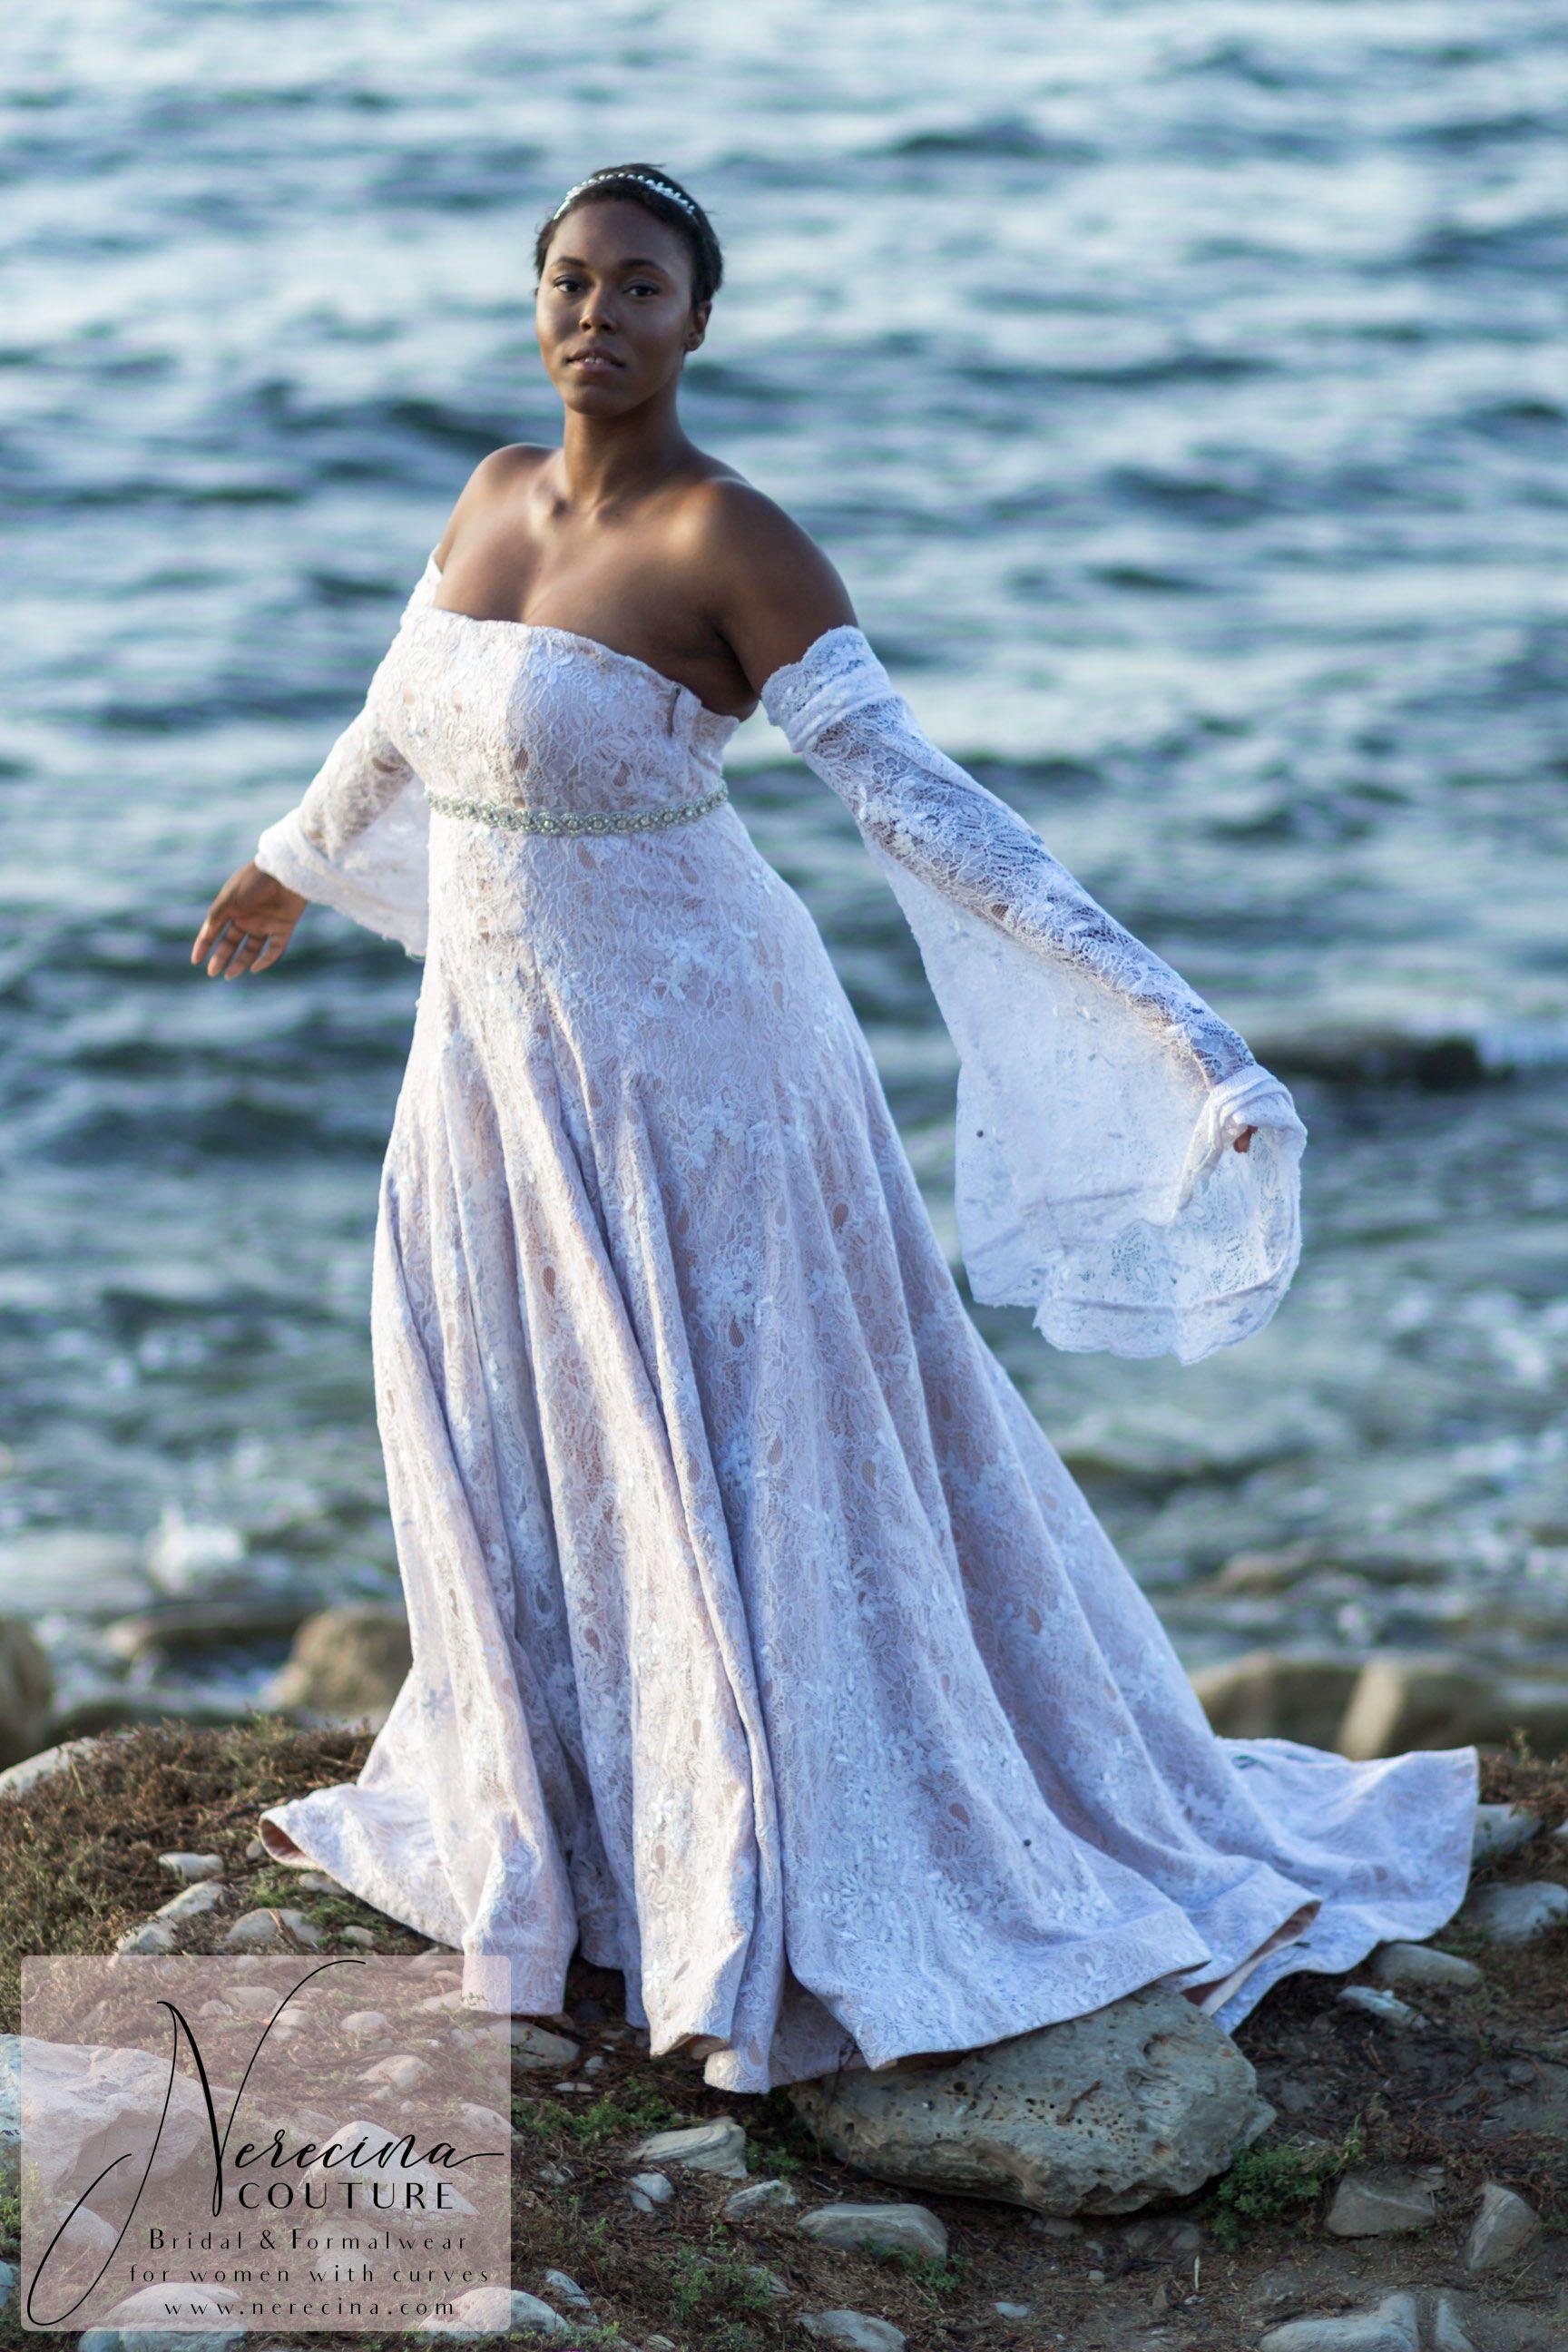 Nerecina Couture Plus Size Wedding Dress Wedding Dresses Plus Size Trendy Wedding Dresses Plus Size Wedding [ 2592 x 1728 Pixel ]